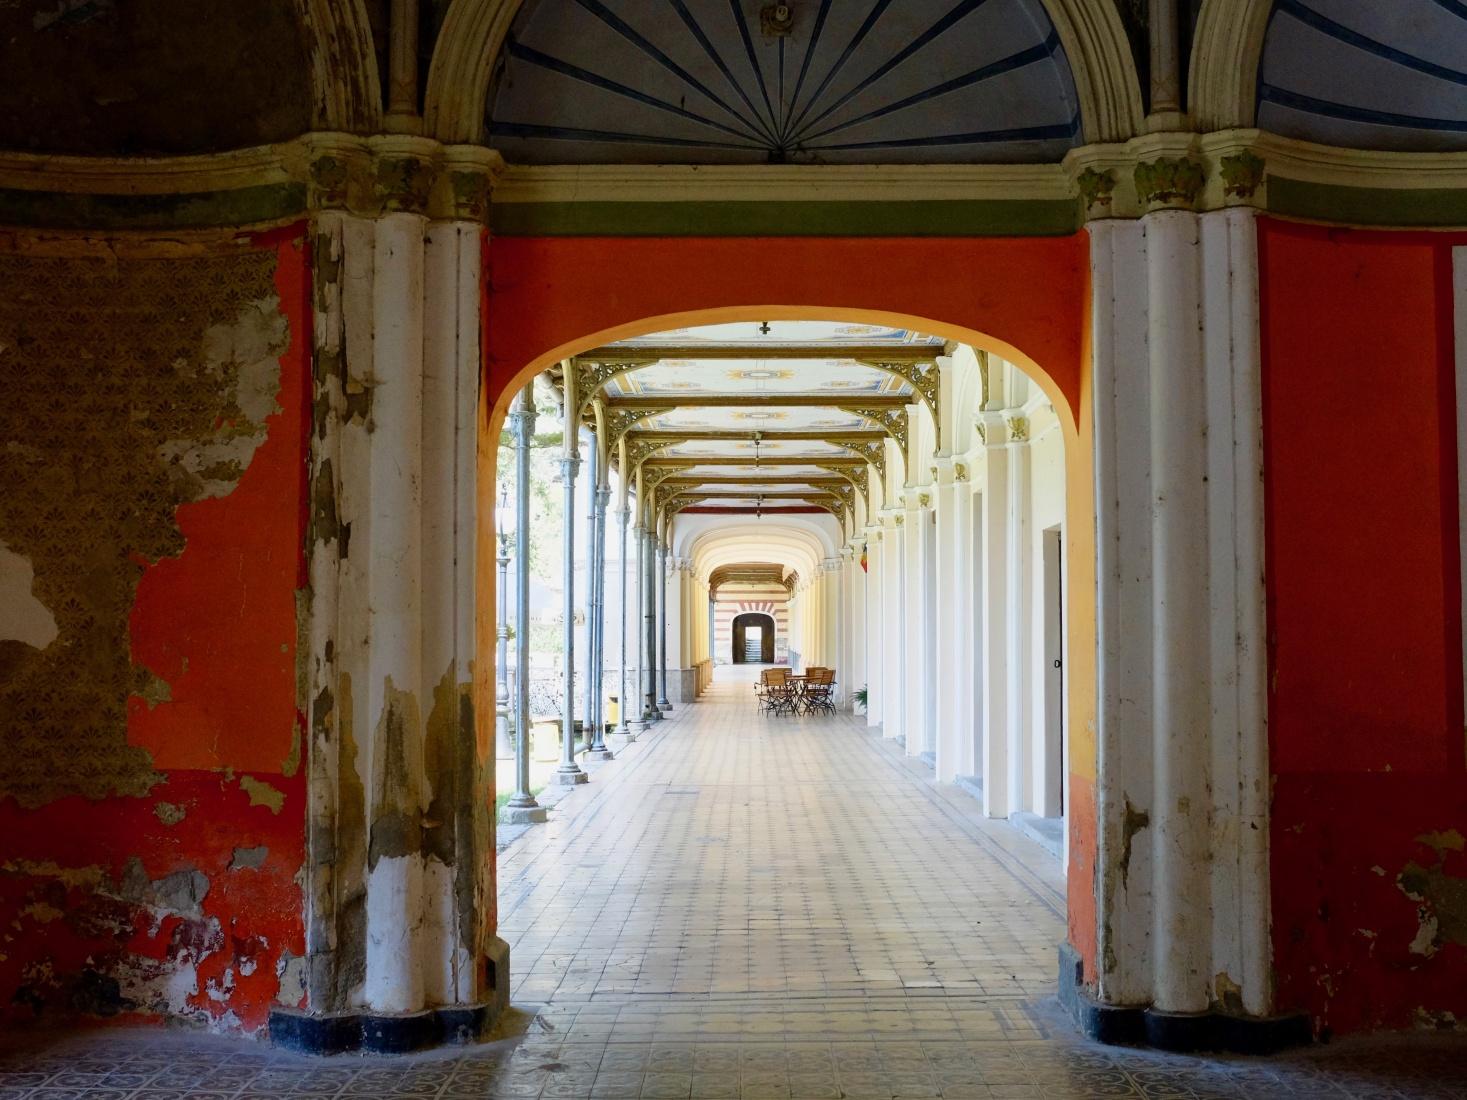 Neo-Baroque arcades around the exterior of the former casino in Brașov, Romania.